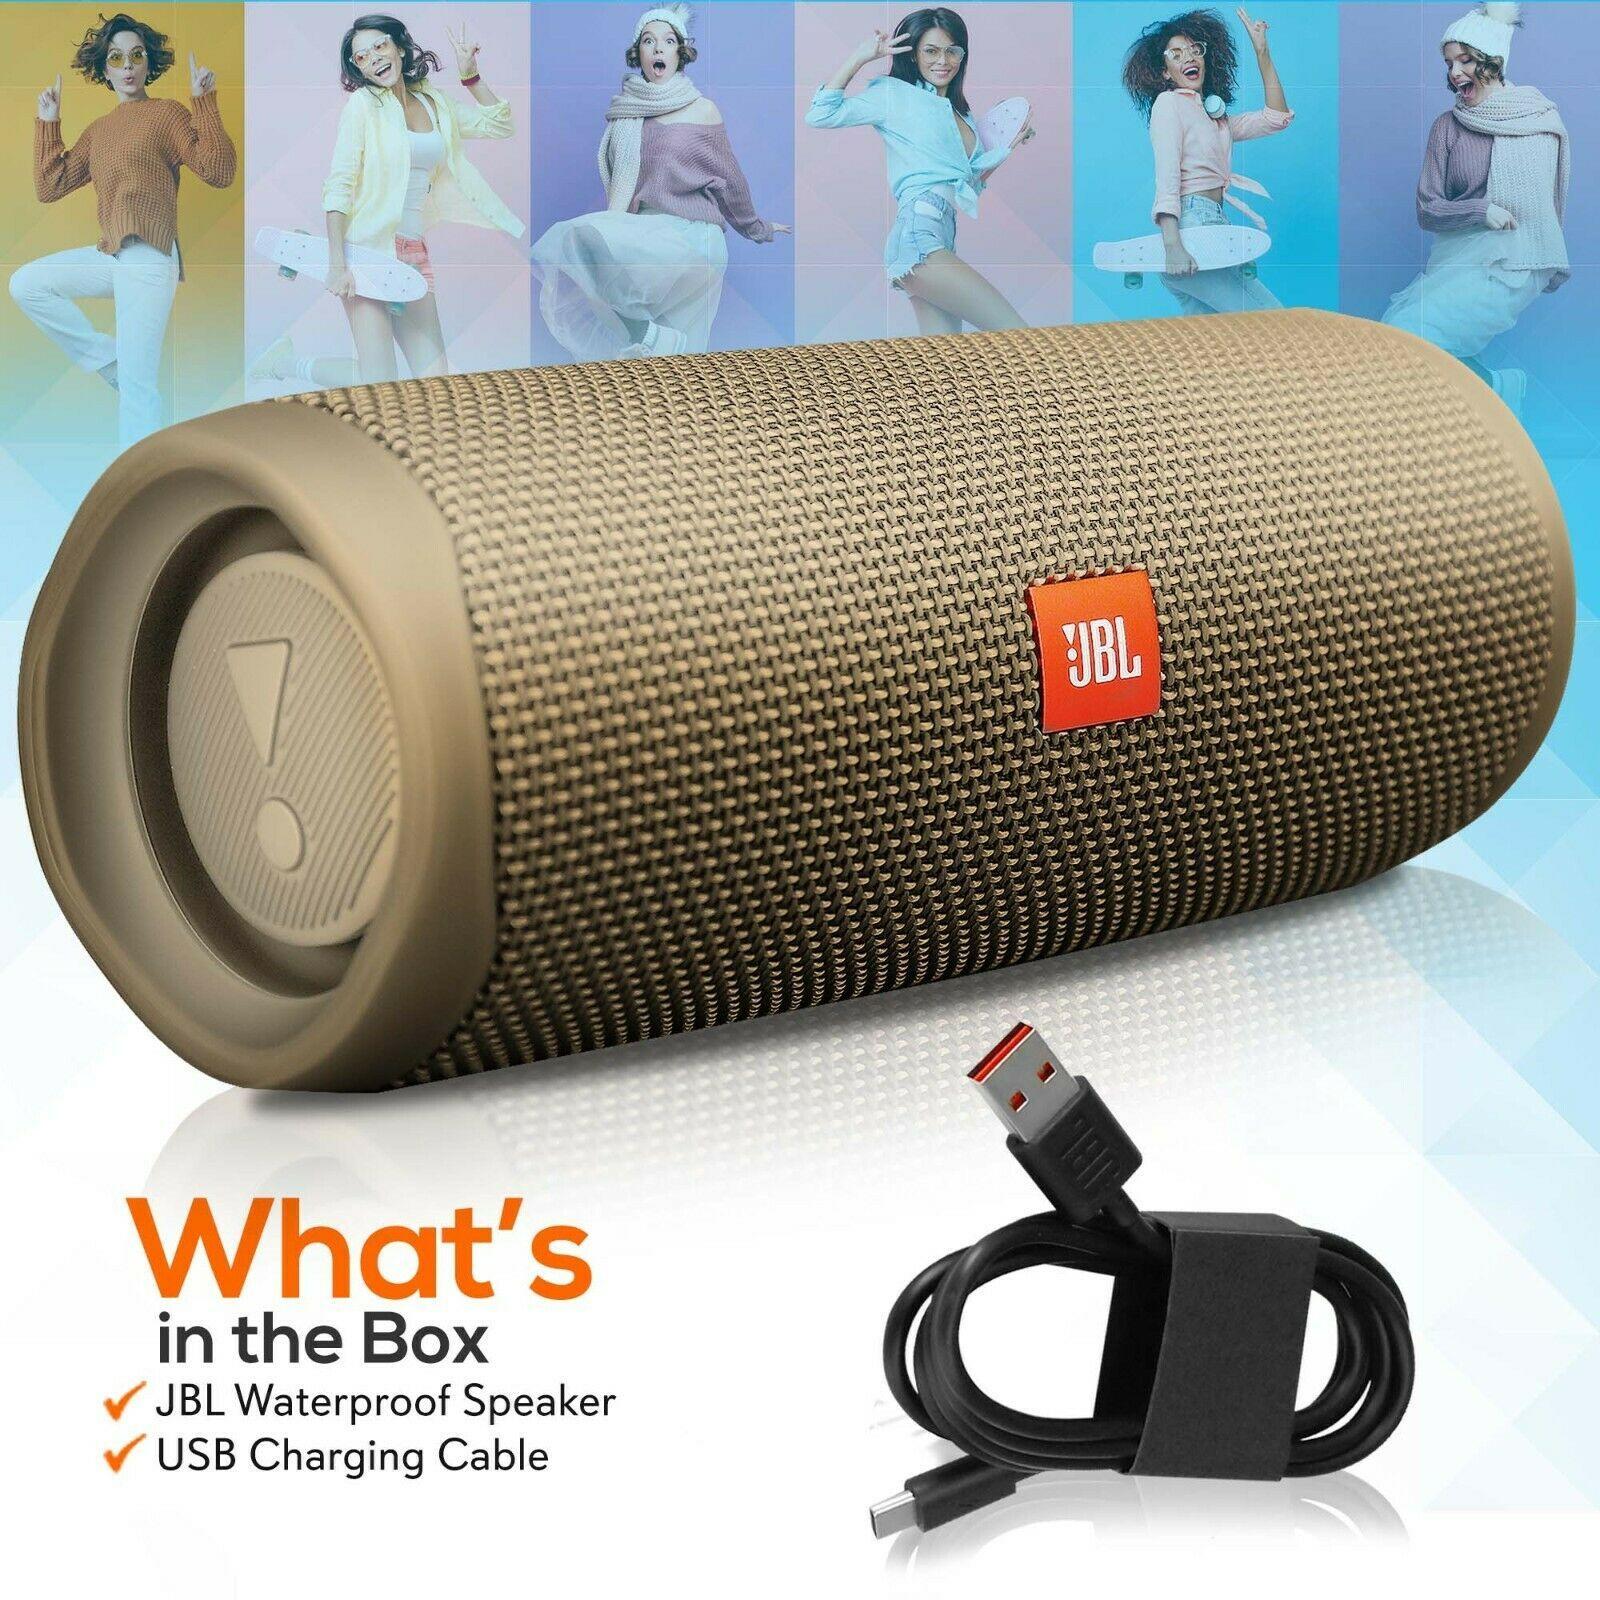 Jbl Flip 5 Waterproof Portable Bluetooth Speaker Sand Bluetooth Speakers Waterproof In 2020 Waterproof Speaker Jbl Waterproof Speaker Waterproof Bluetooth Speaker